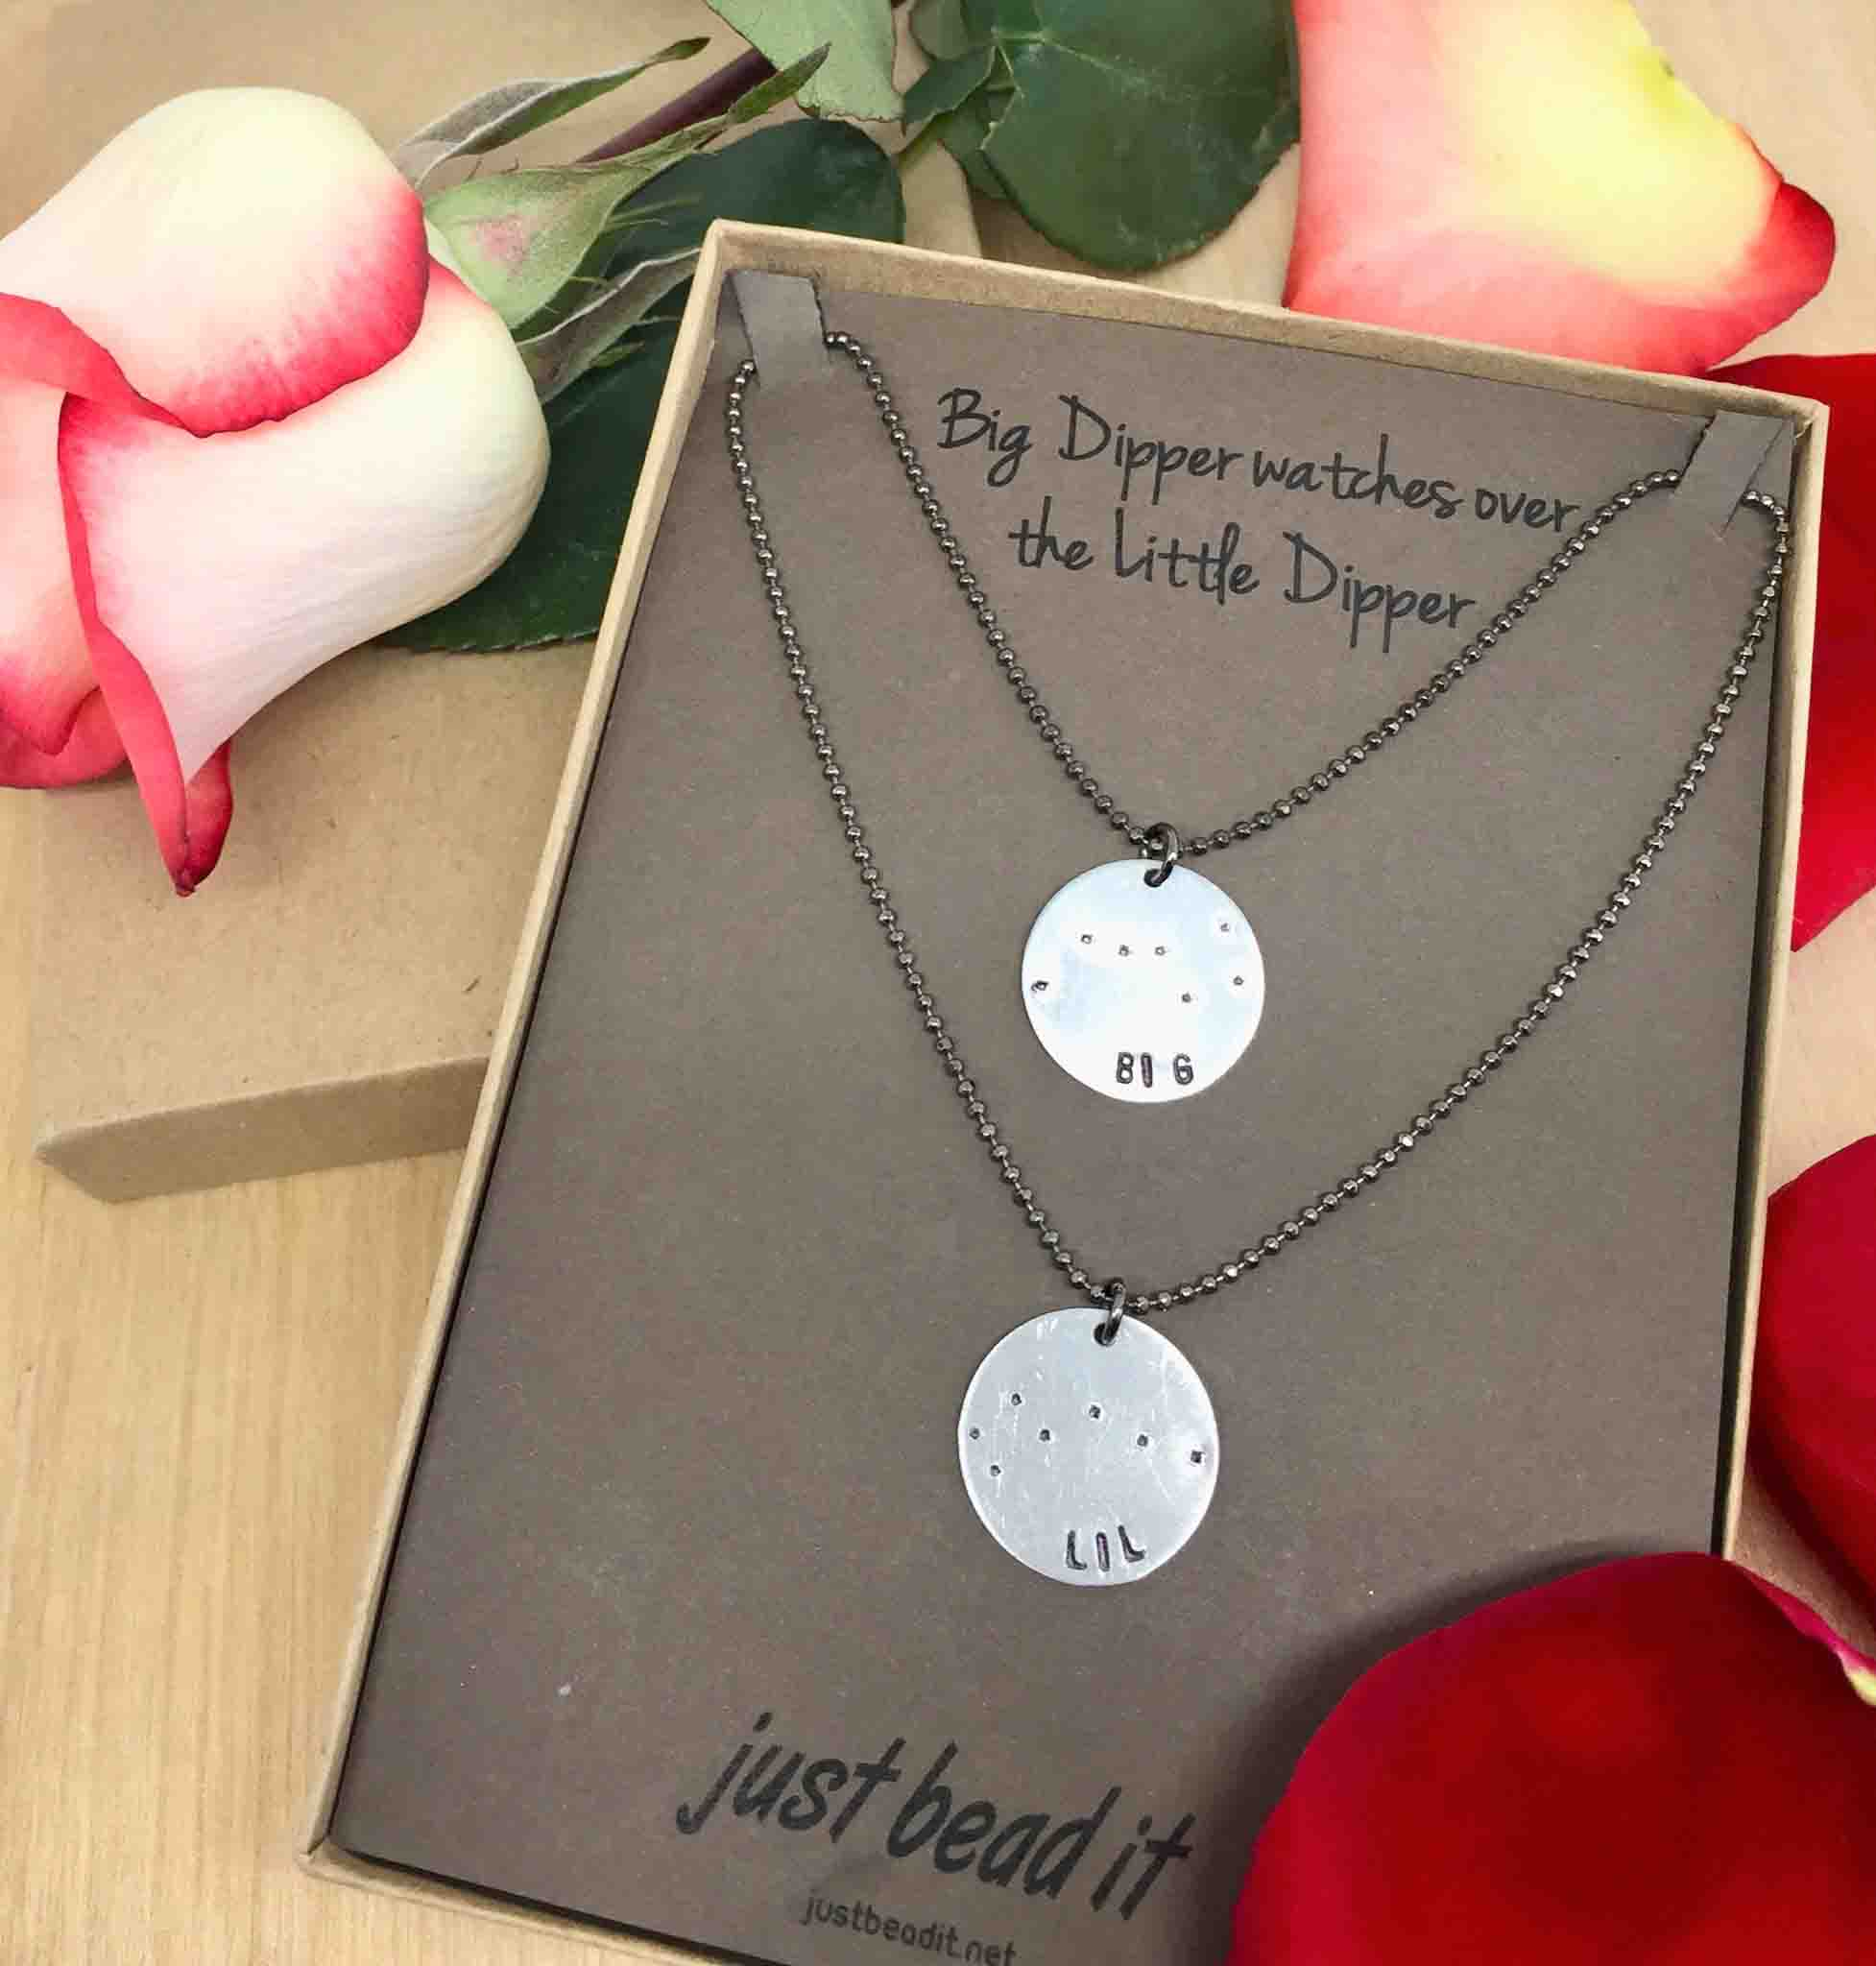 Little Dipper Sisters Big Dipper Hand-Painted Ursa Major Mother Daughter Jewelry Ursa Minor Constellation Locket Necklace Set